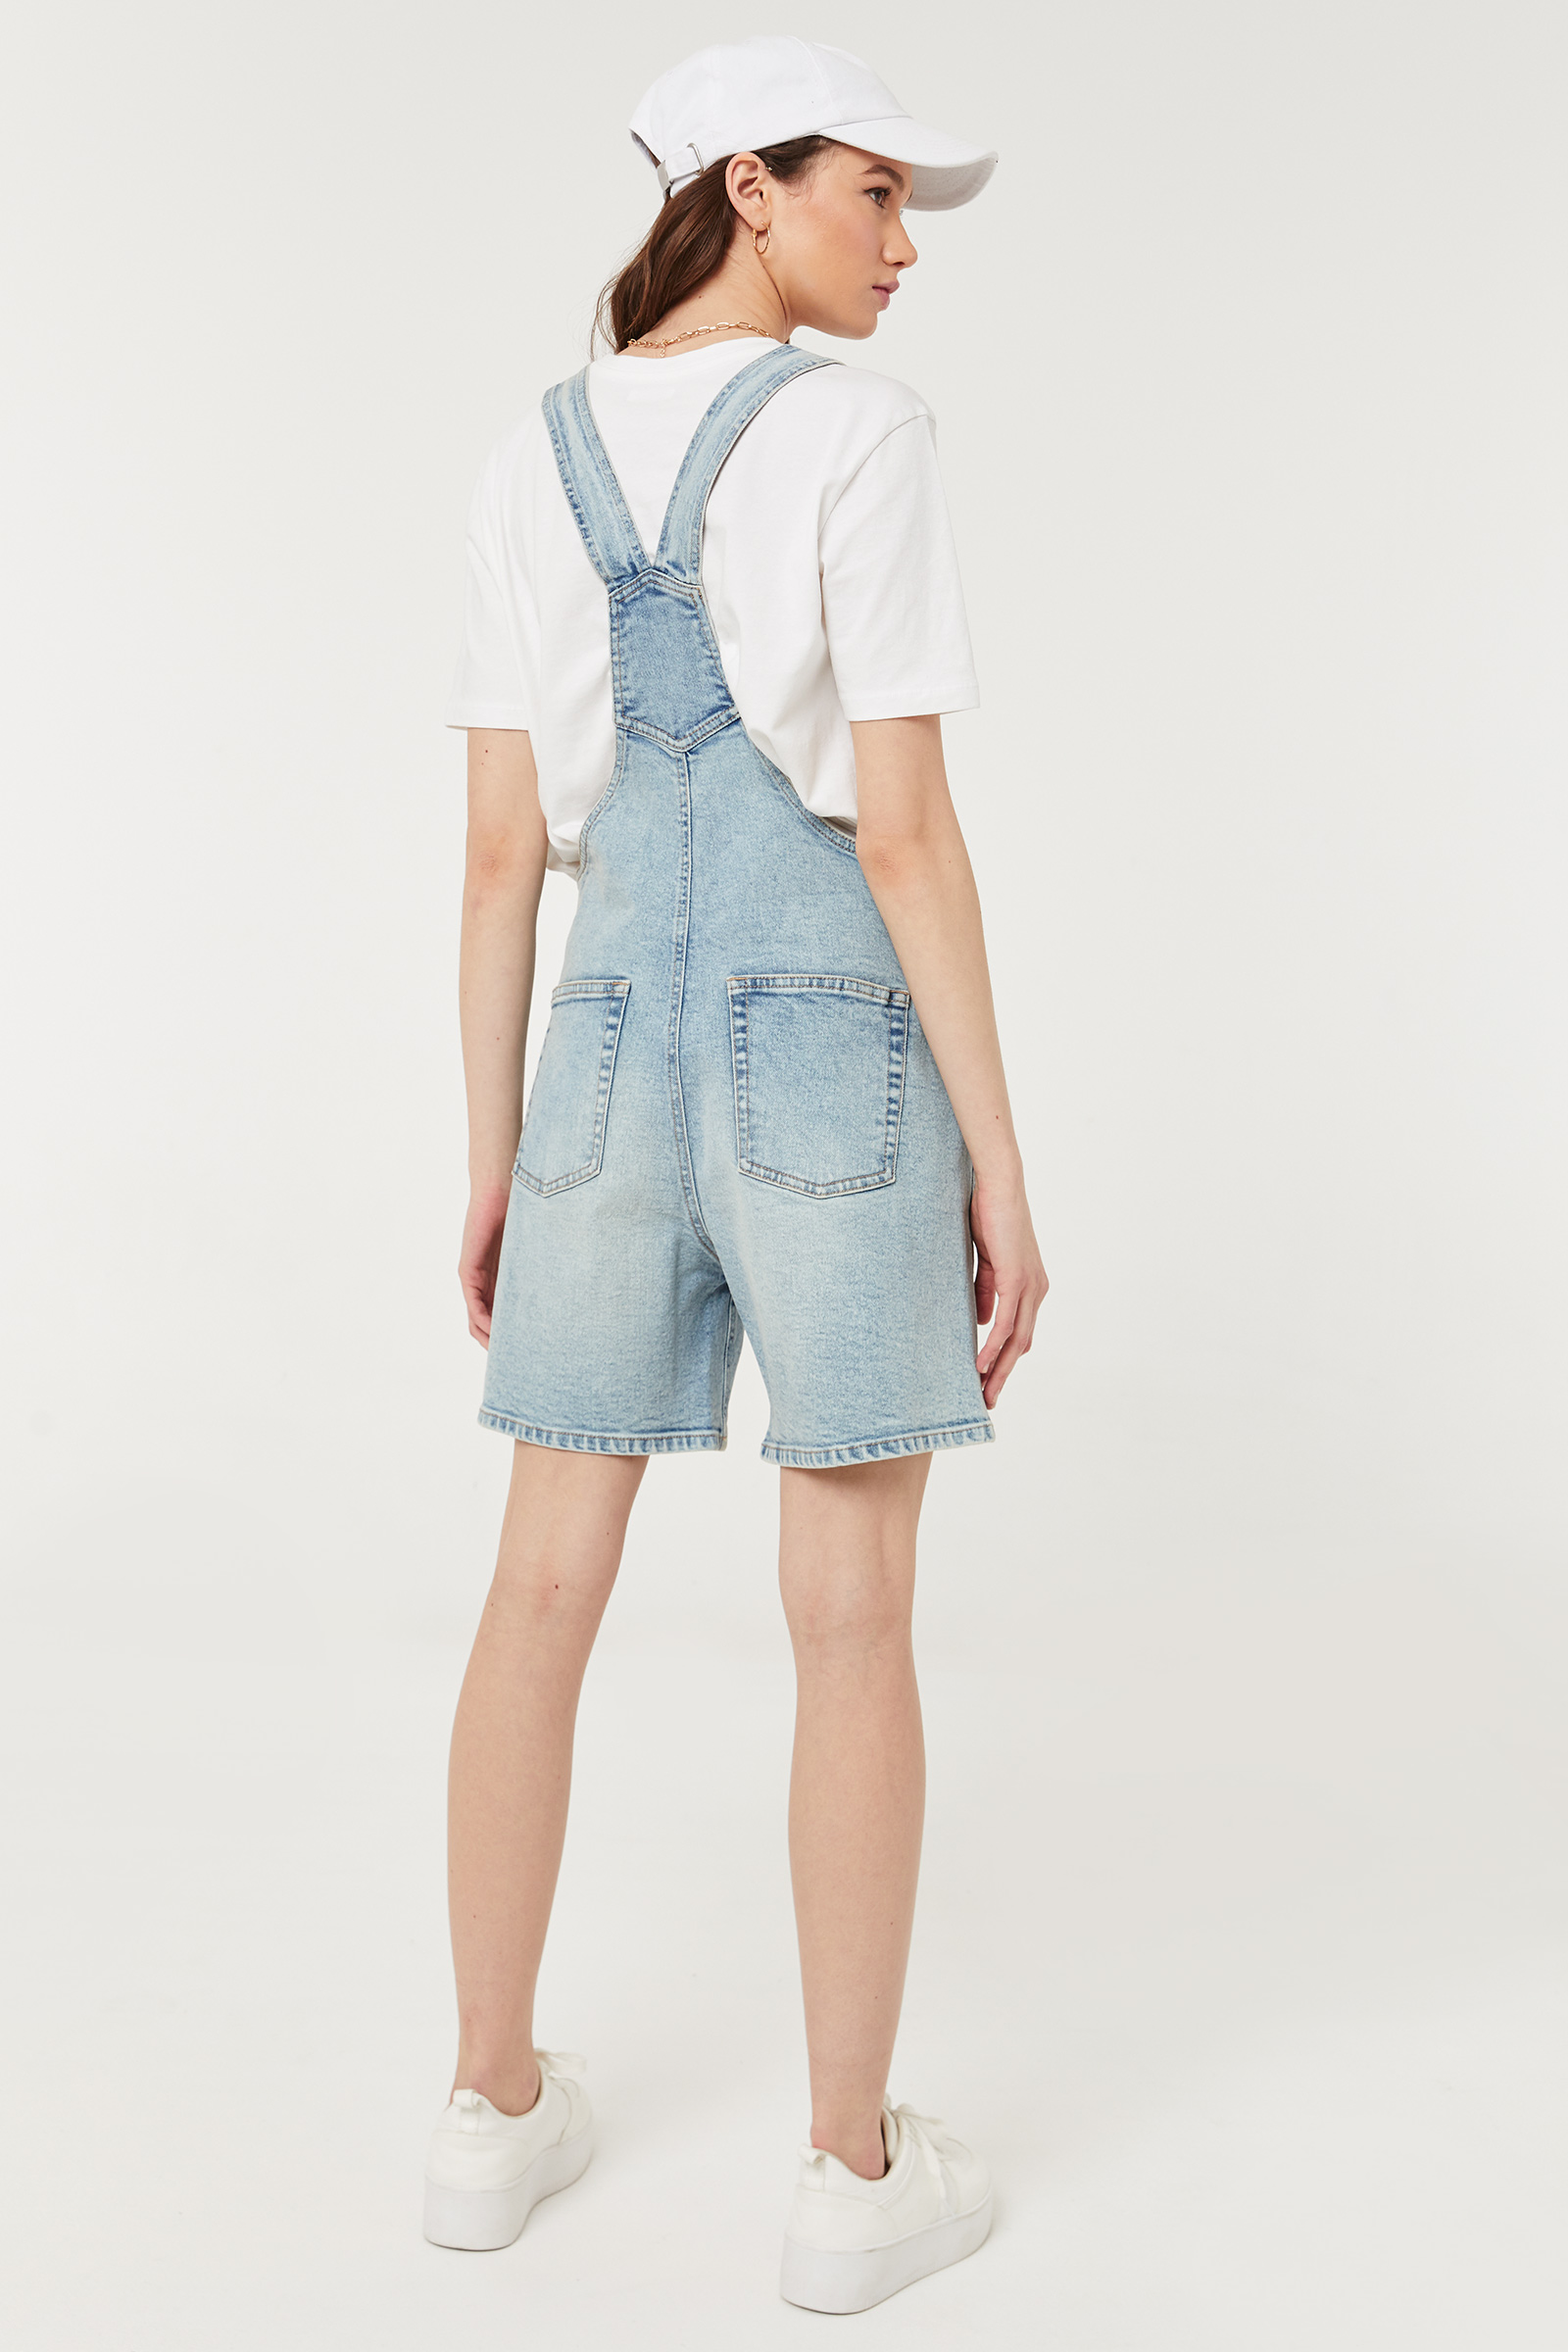 Cuffed Jean Short Overalls